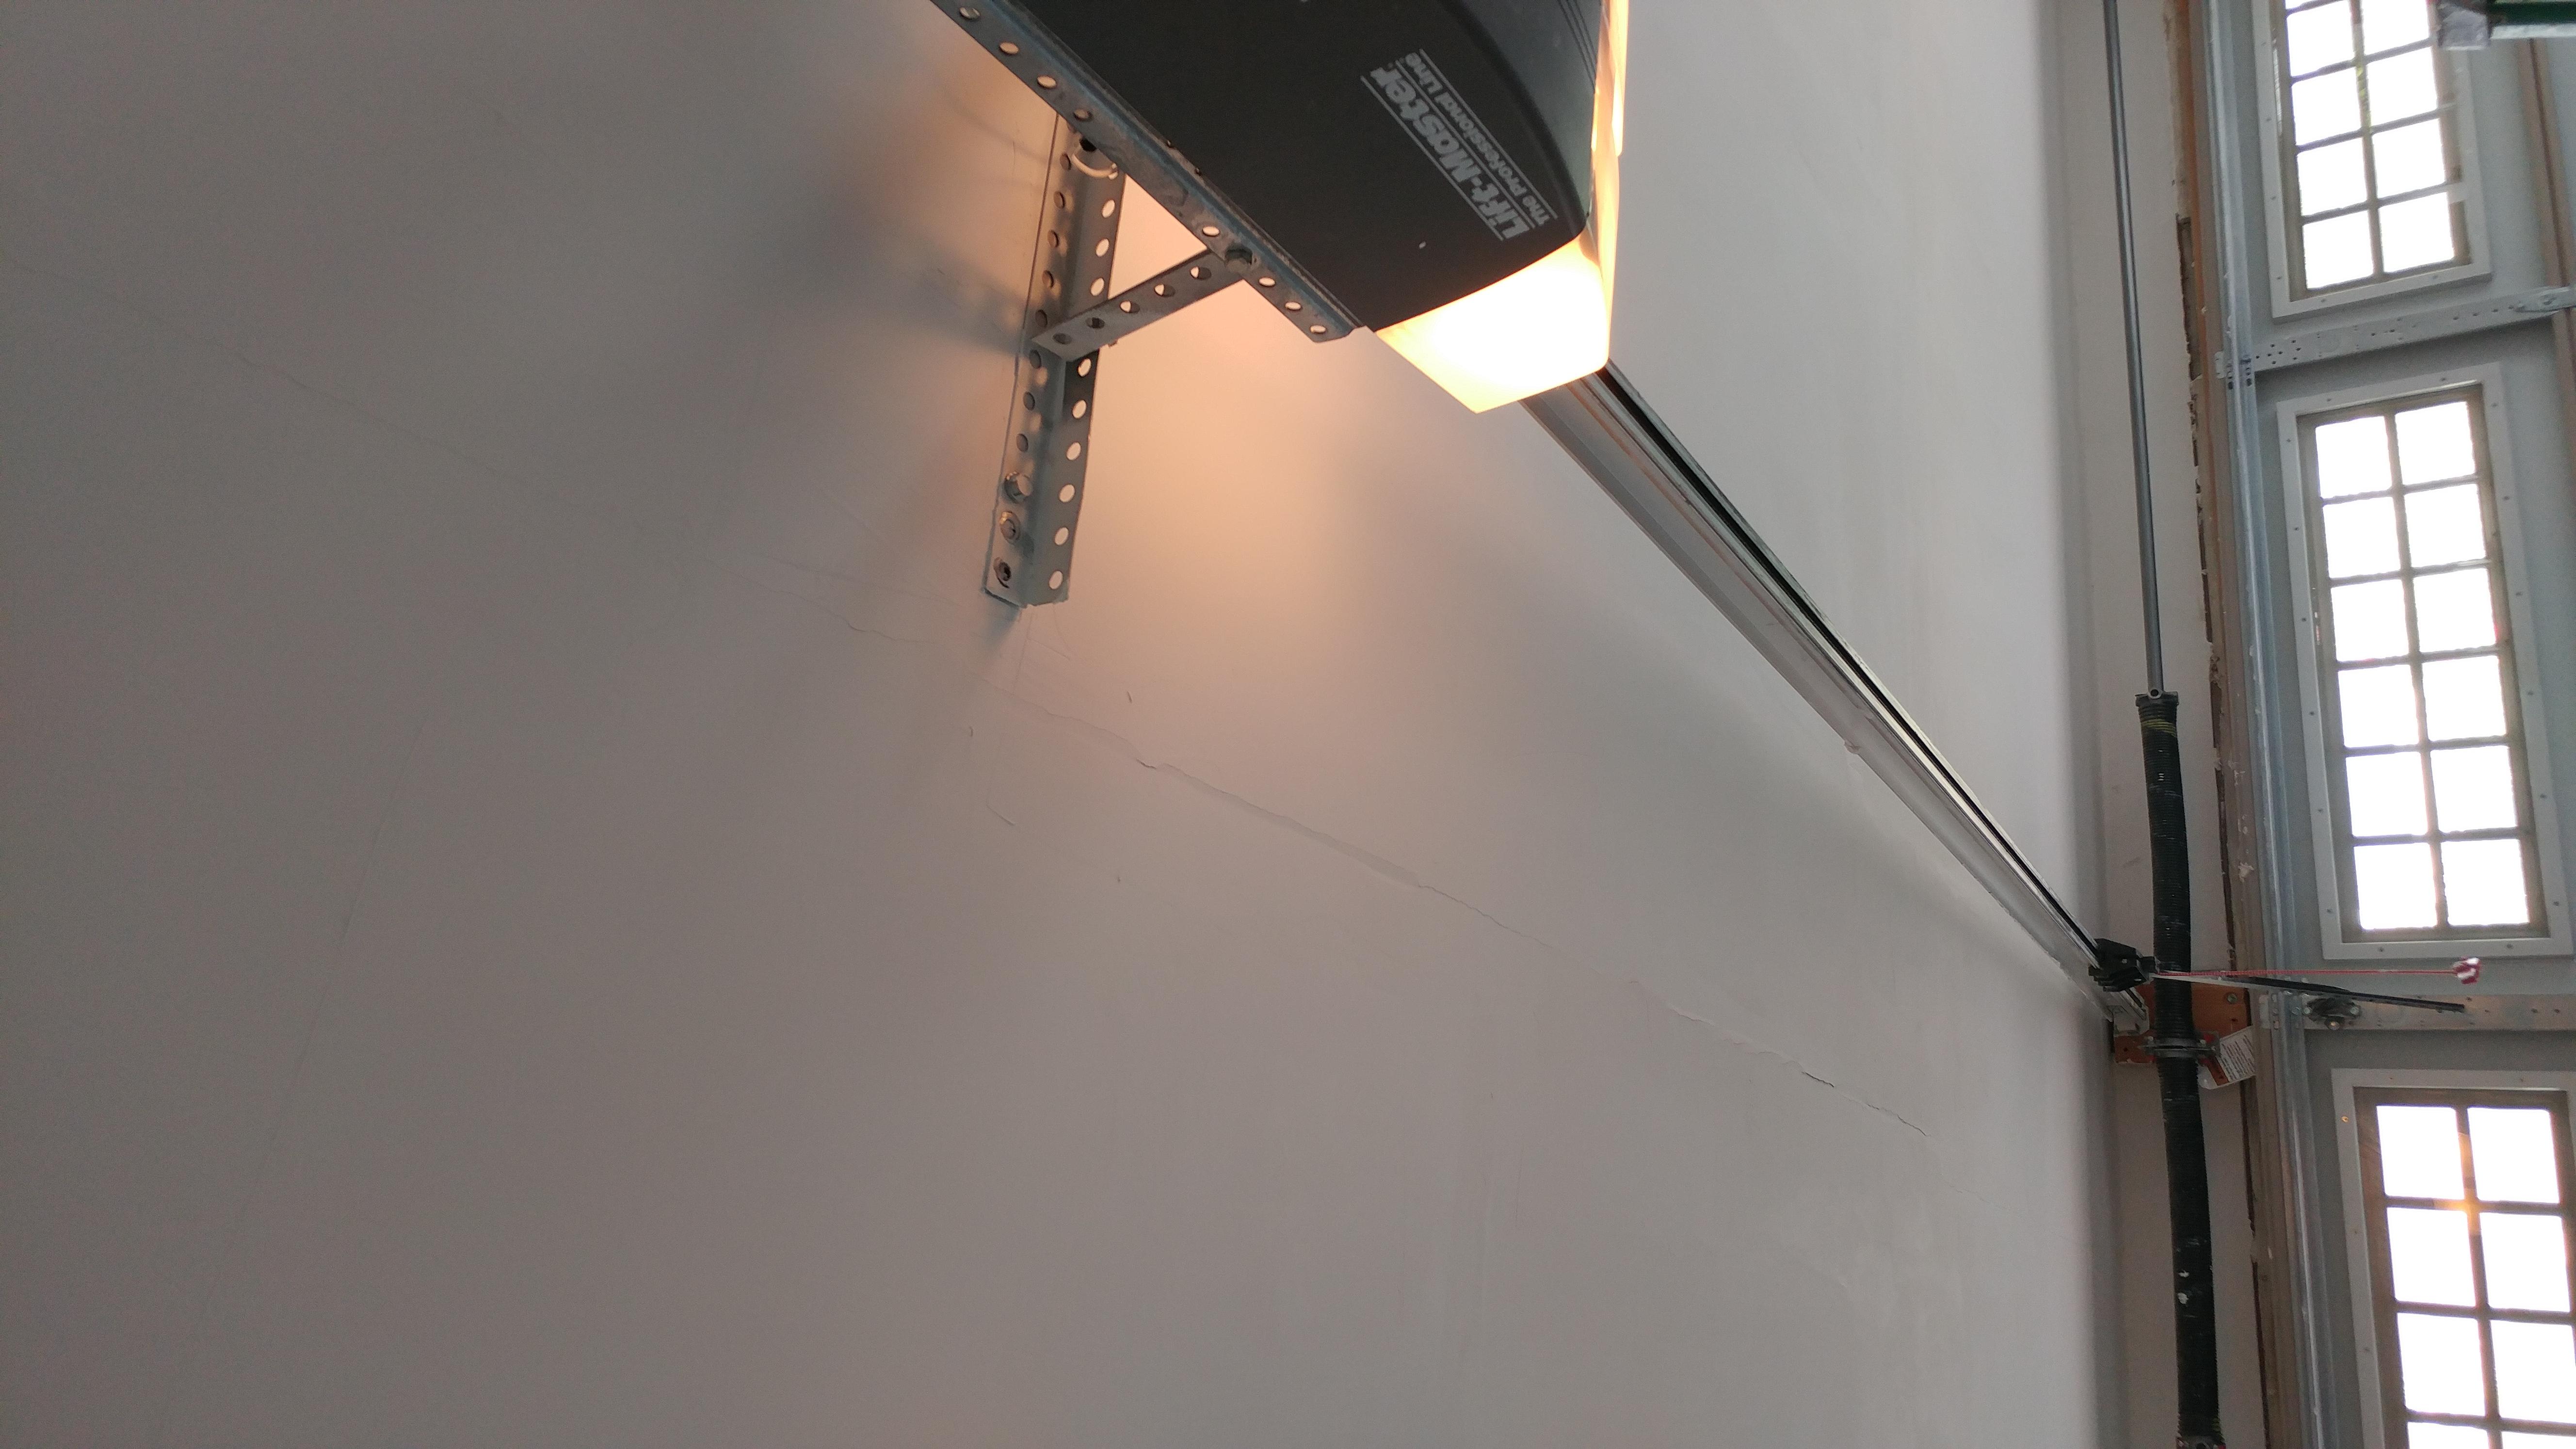 Drywall Cracks, installed yesterday-0307180905_1520438780397.jpg